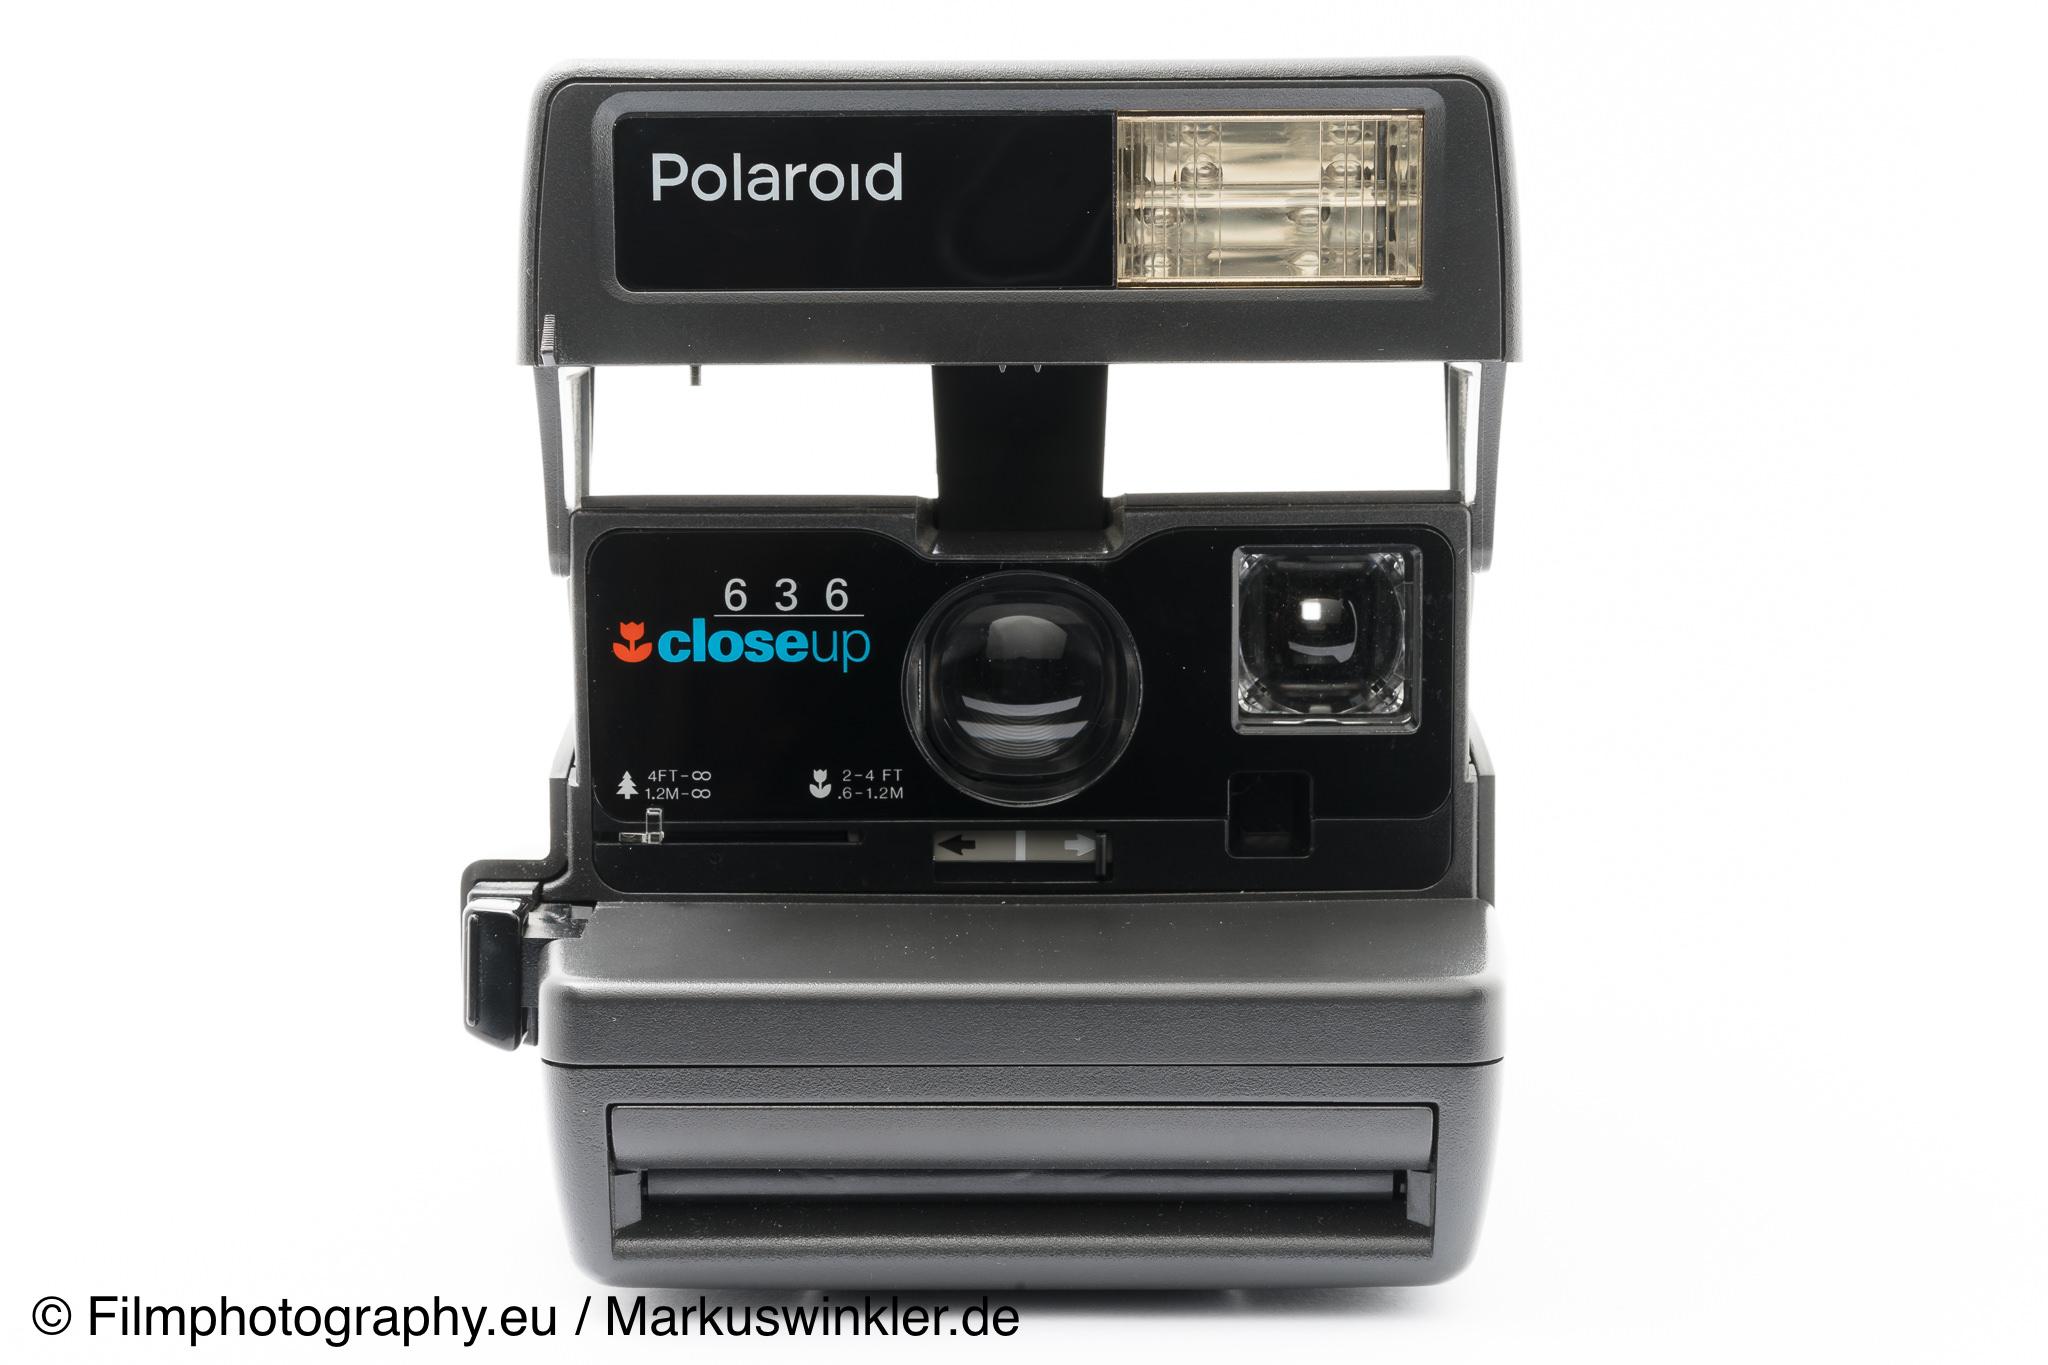 polaroid one step abgerundete ecken sofortbildkamera generation. Black Bedroom Furniture Sets. Home Design Ideas